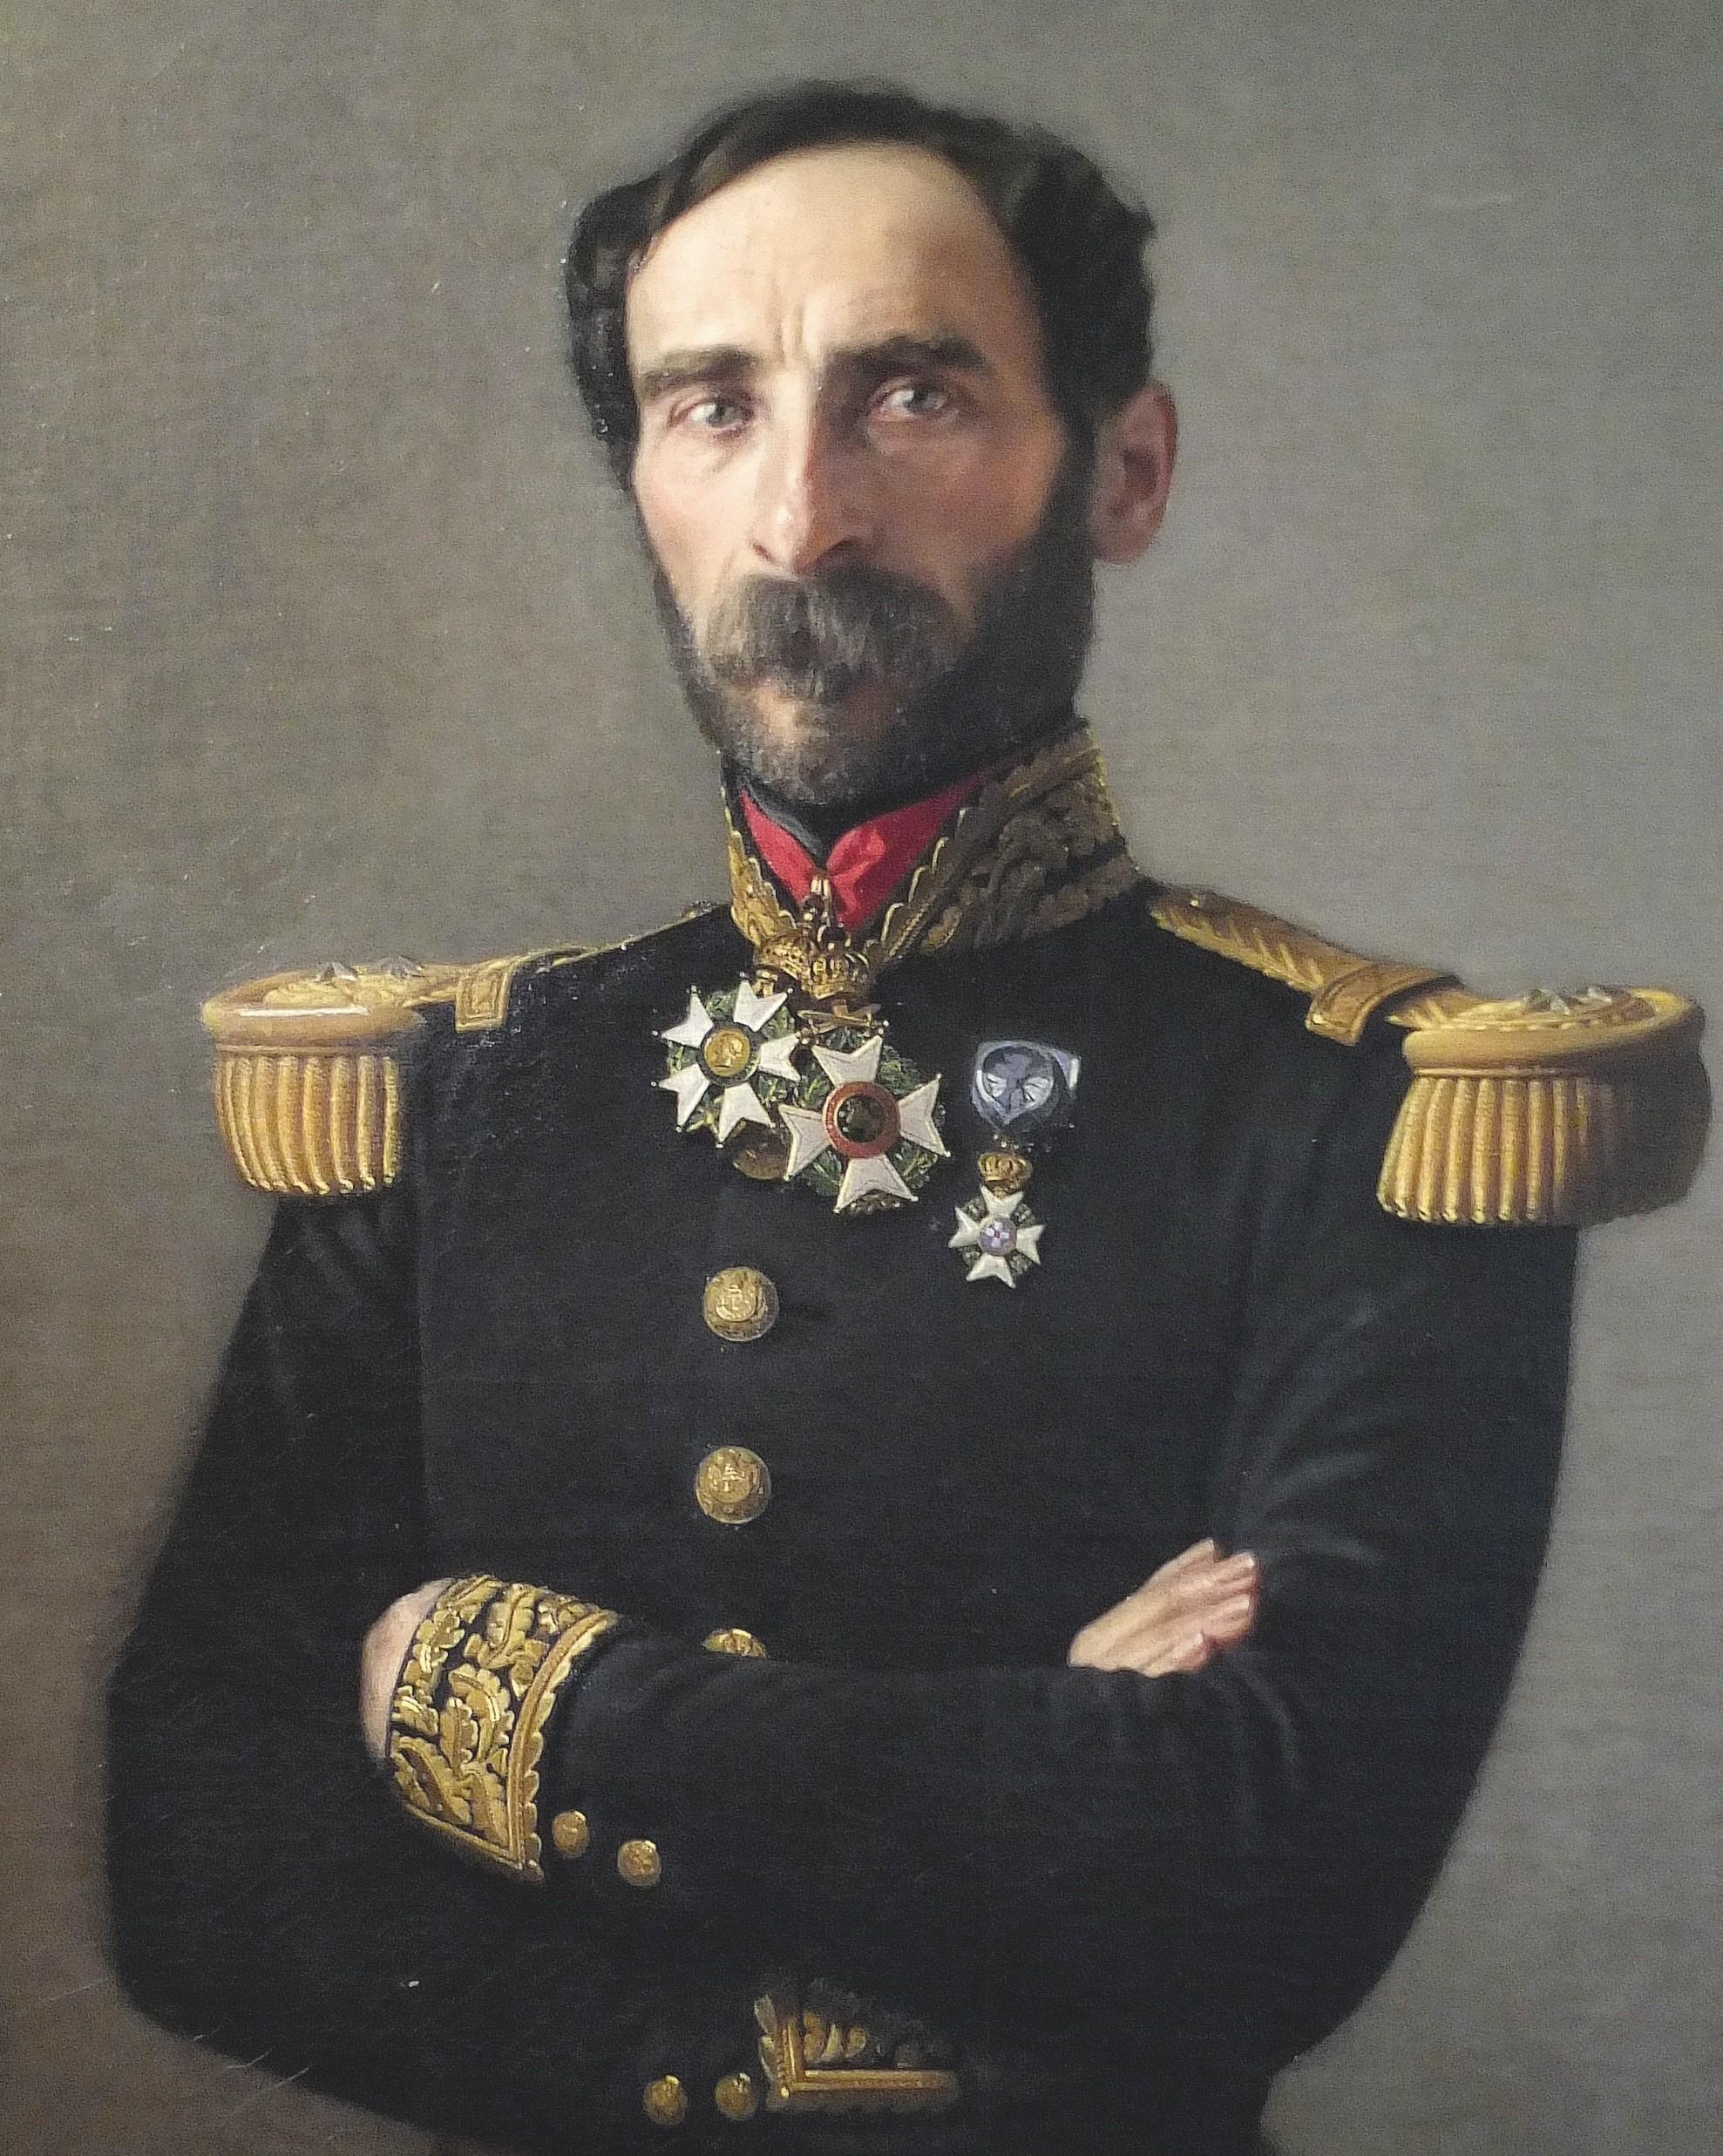 Le général Cavaignac